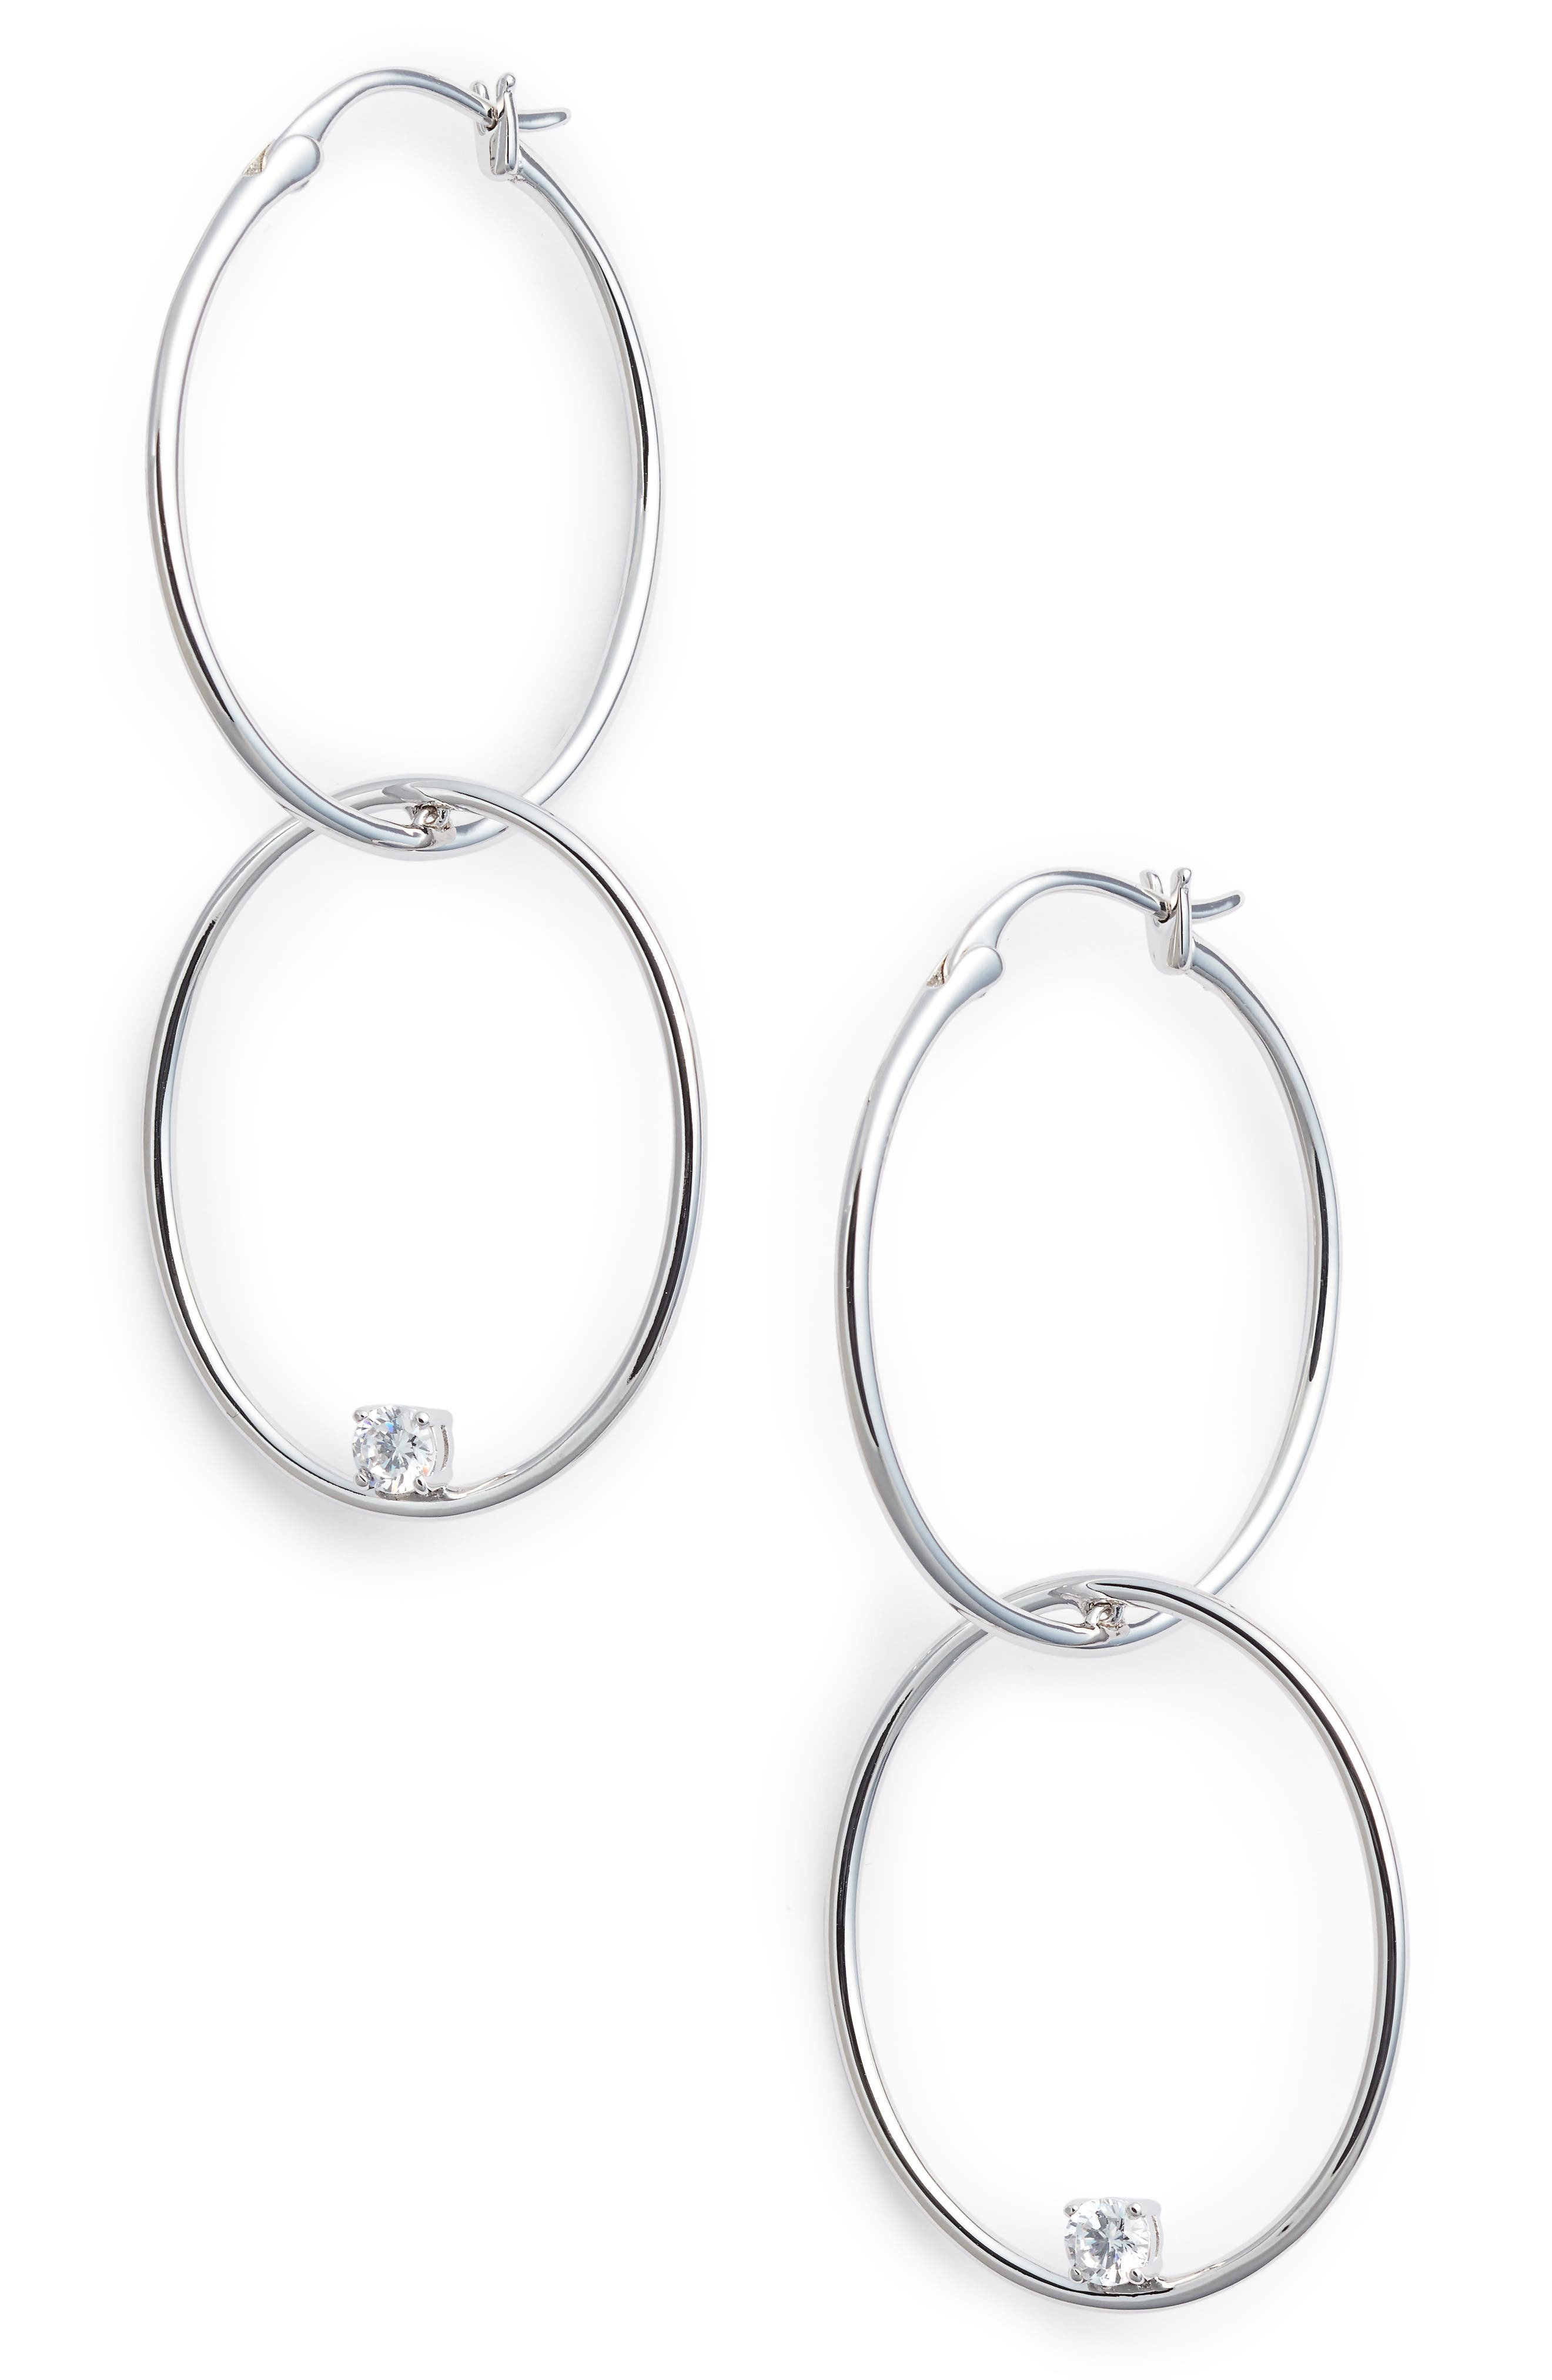 Drop Earrings,                         Main,                         color, Silver